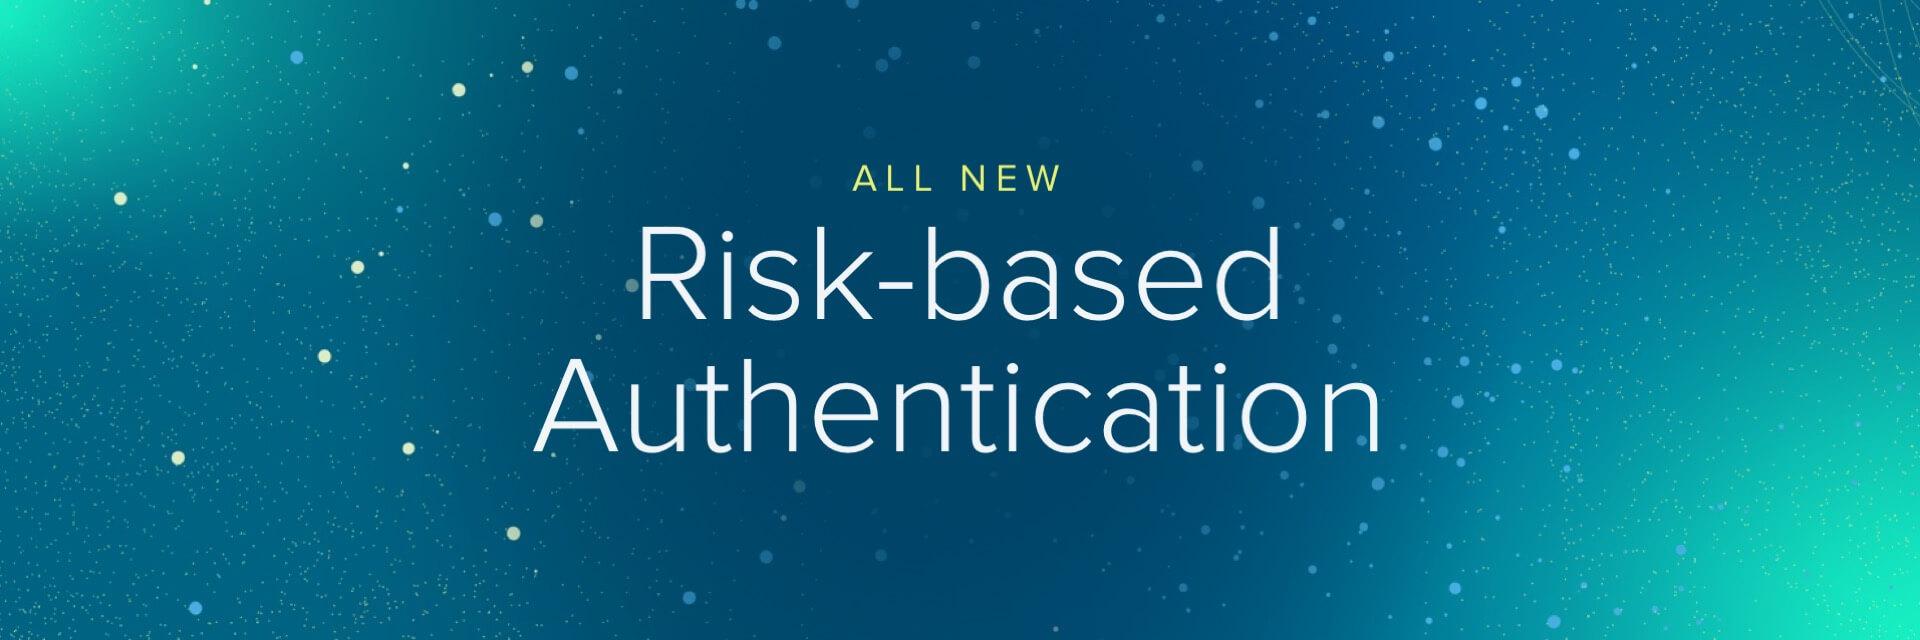 Okta Risk based Authentication blog post